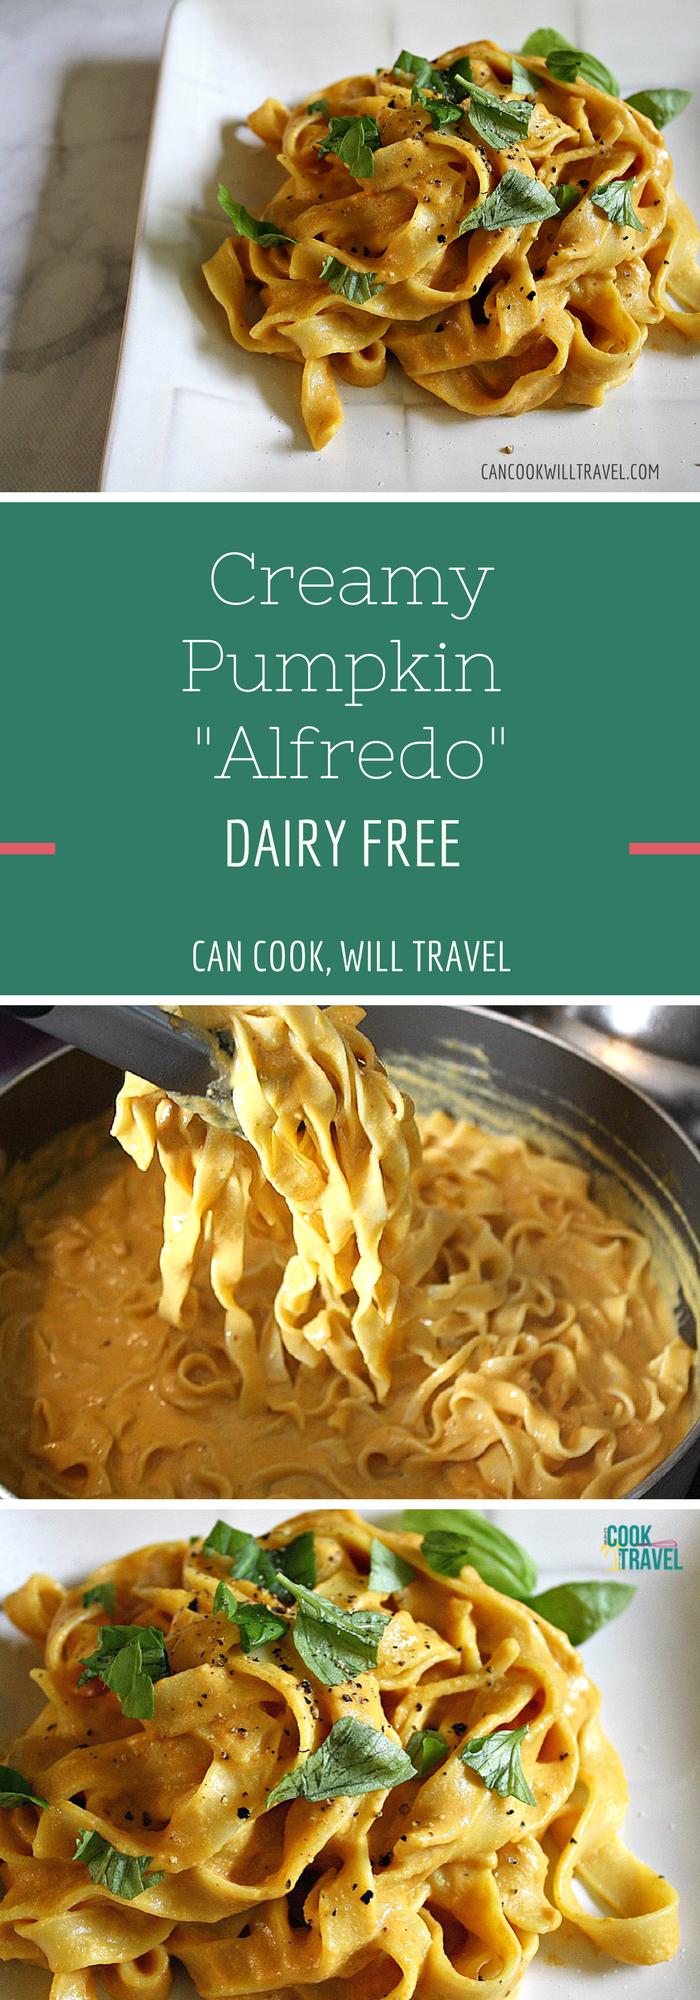 Creamy Pumpkin Alfredo_Collage2